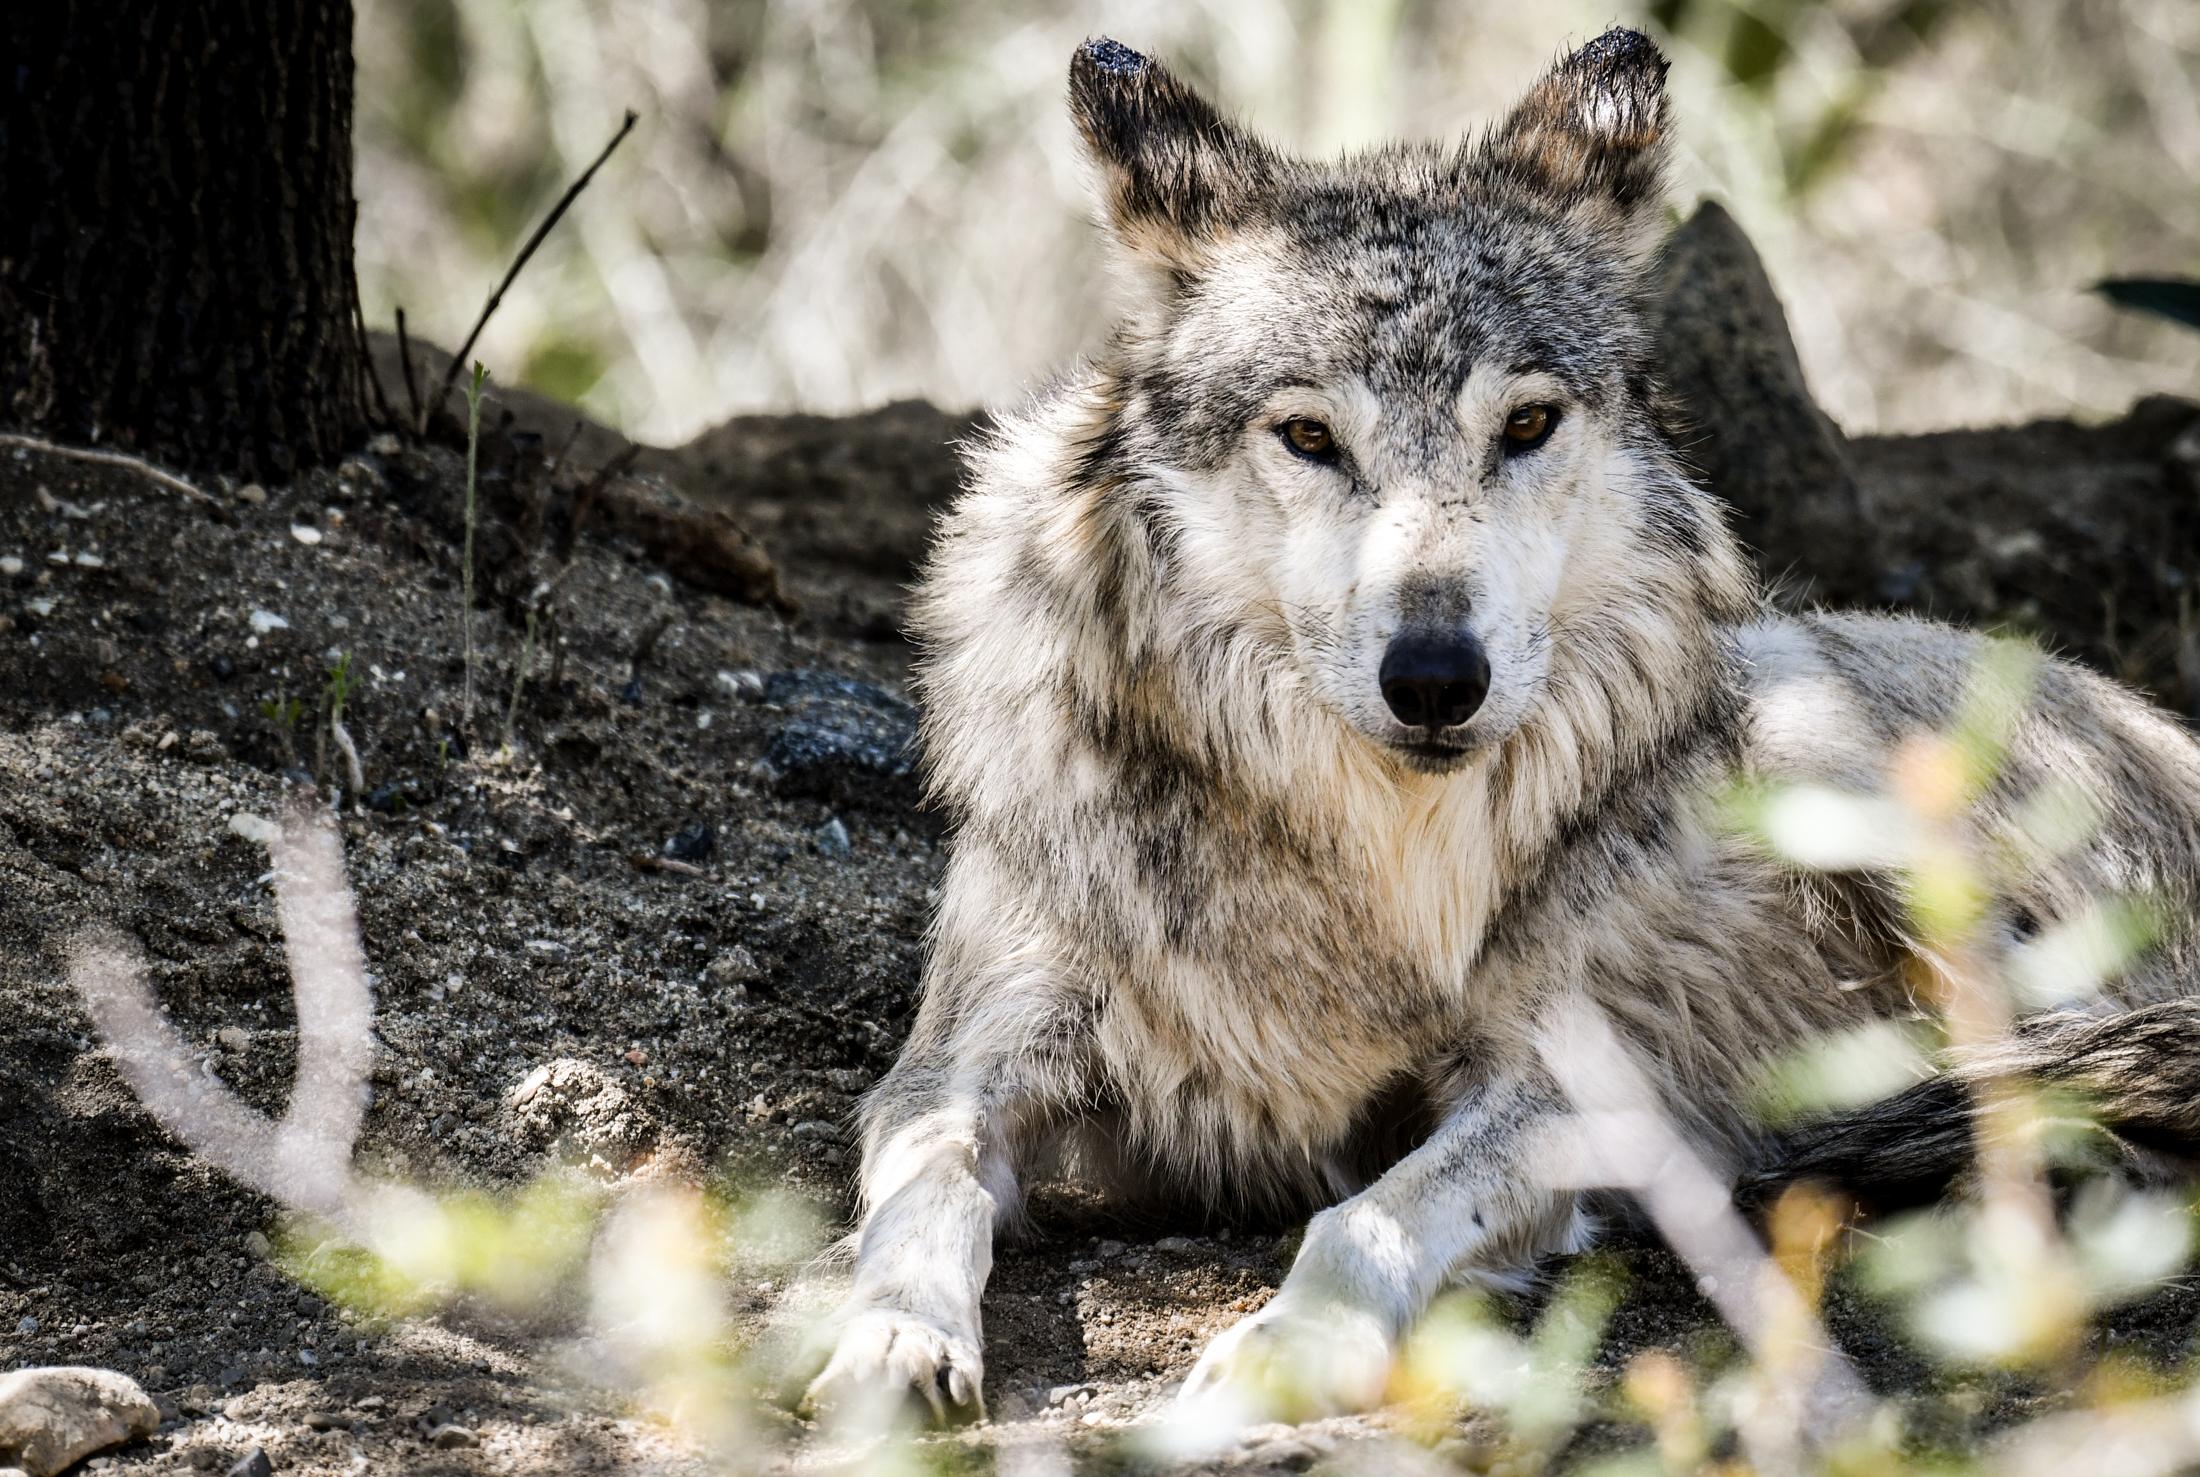 f5.6_640_330mm mexican wolf.jpg